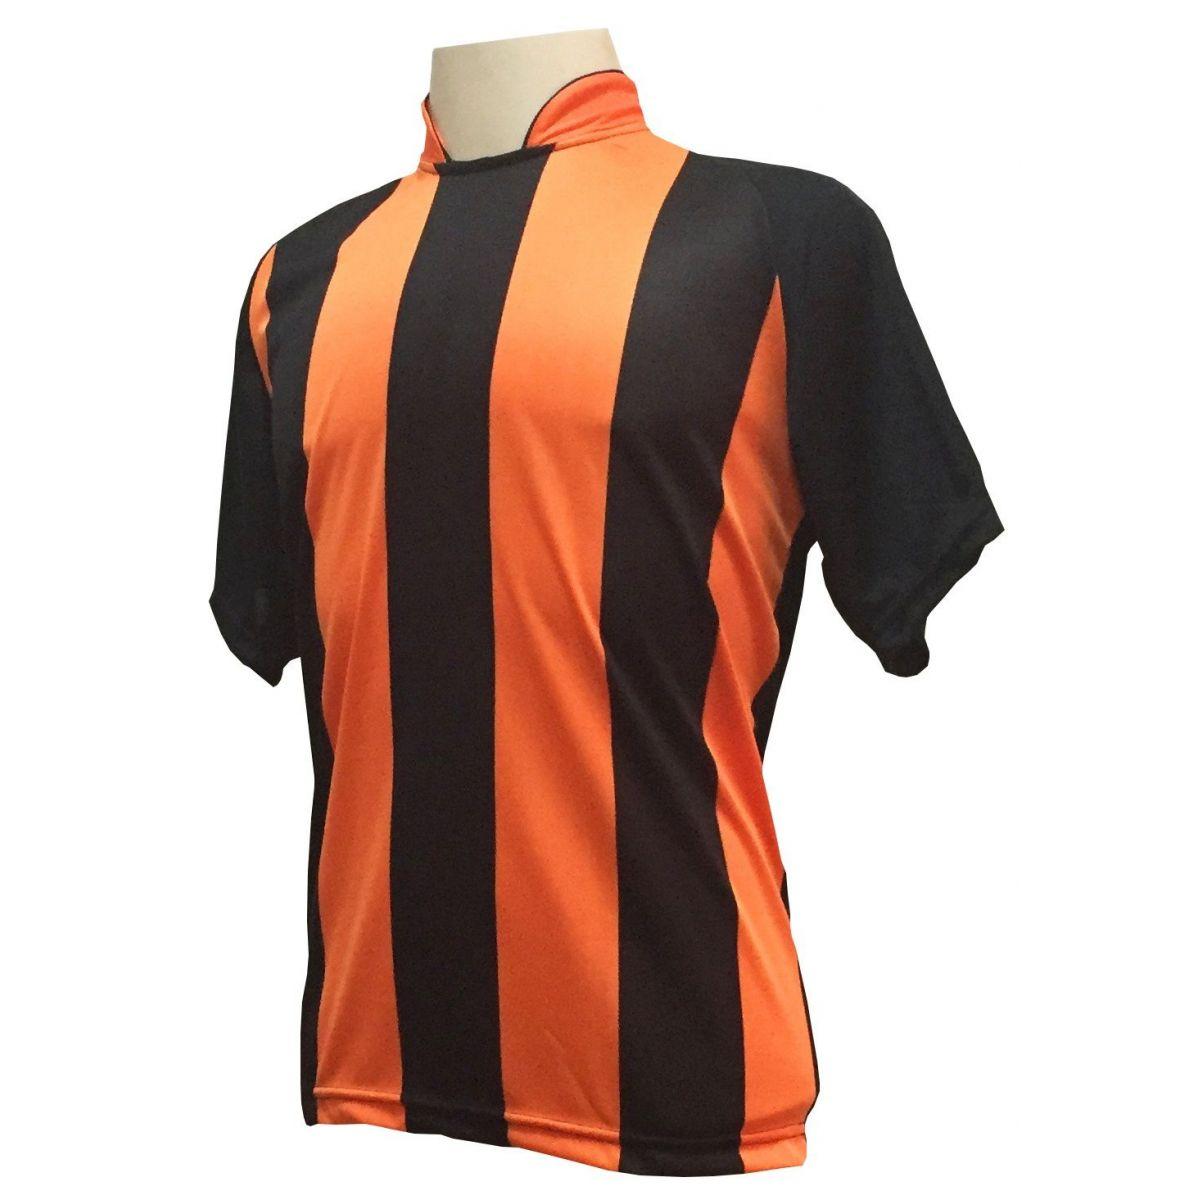 Jogo de Camisa com 20 unidades modelo Milan Preto/Laranja